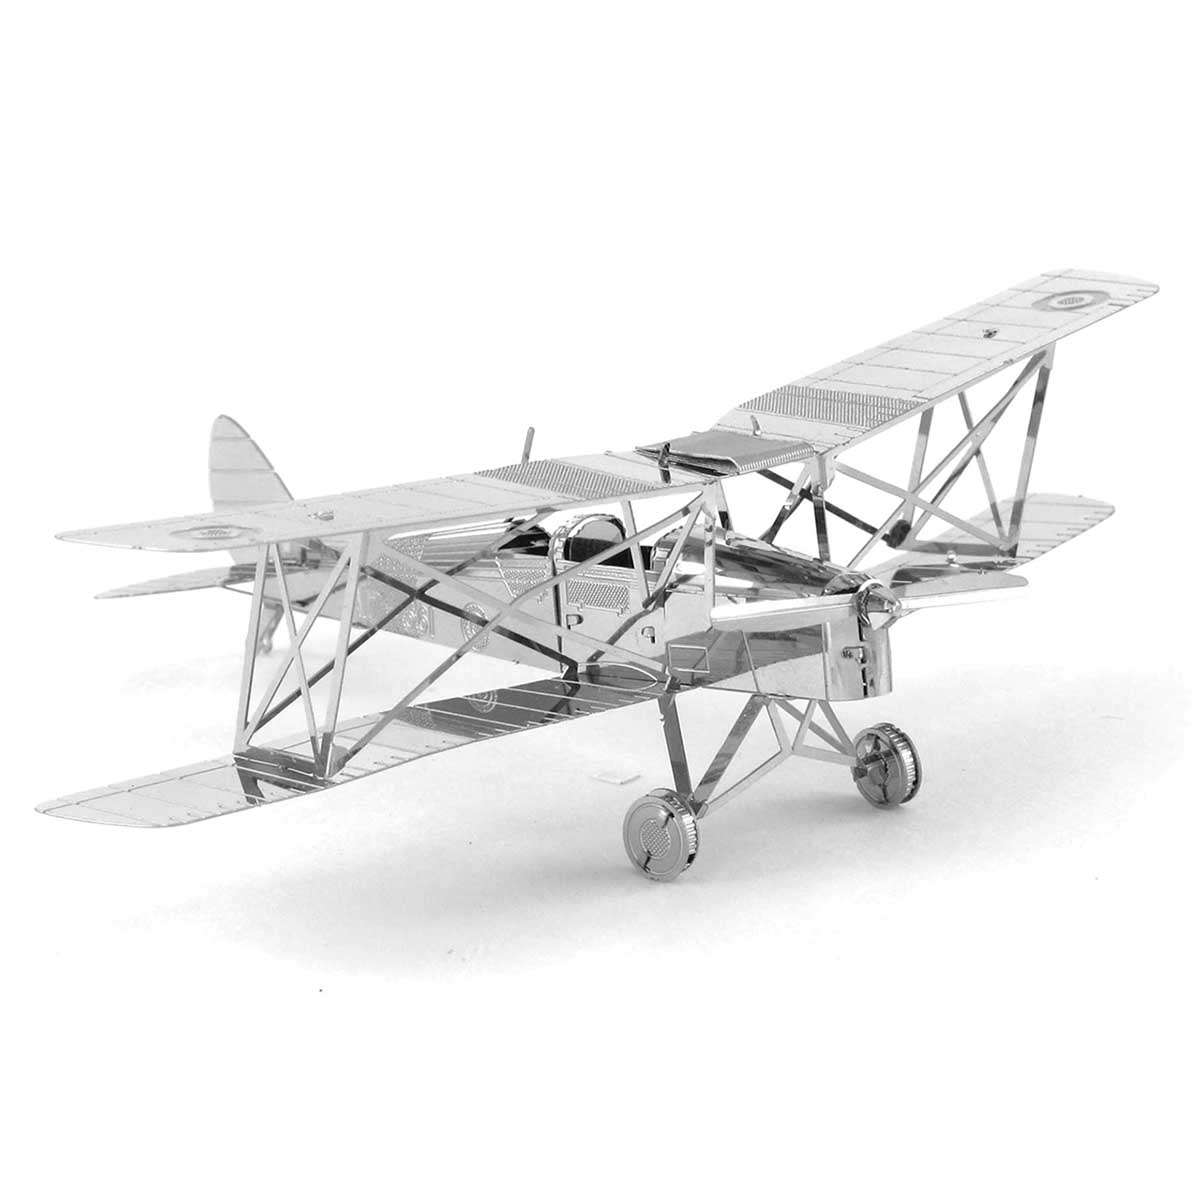 DH82 Tiger Moth Planes 3D Puzzle